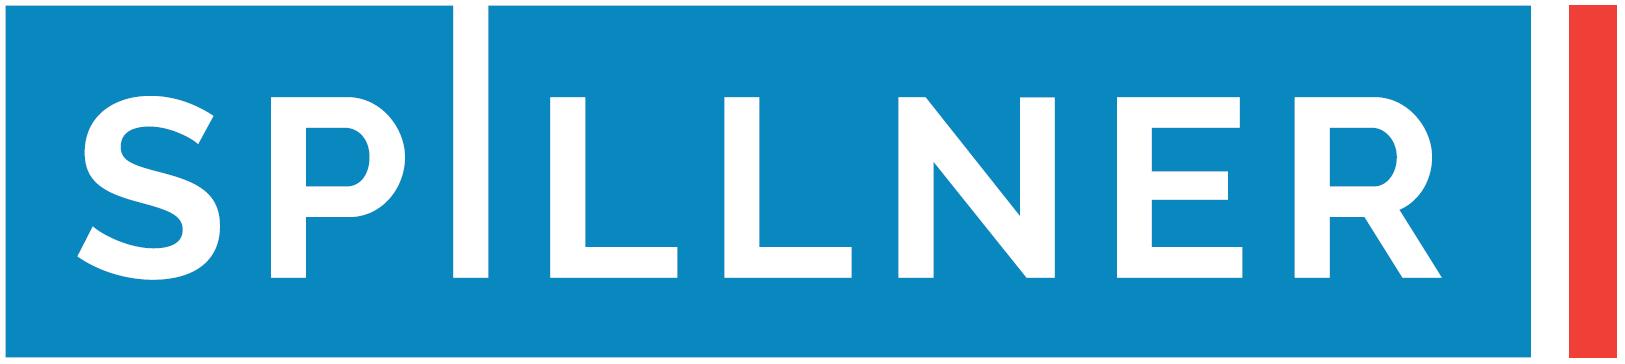 Spillner